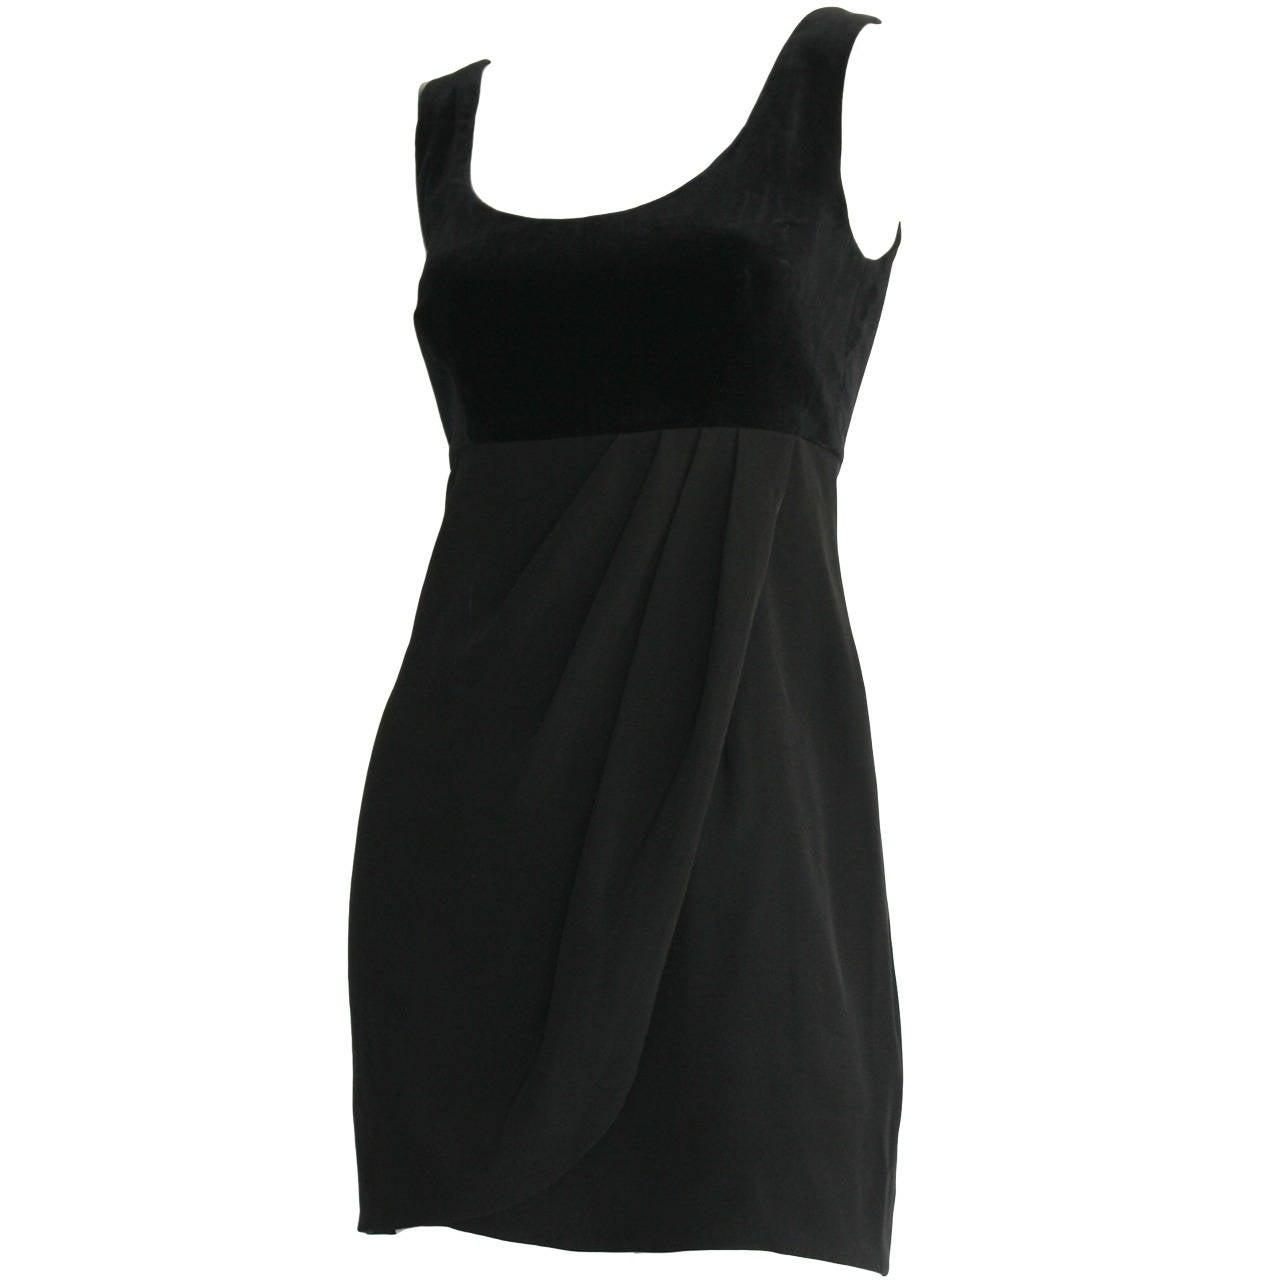 Vintage Guy Laroche Perfect Little Black Dress LBD For Sale at 1stdibs